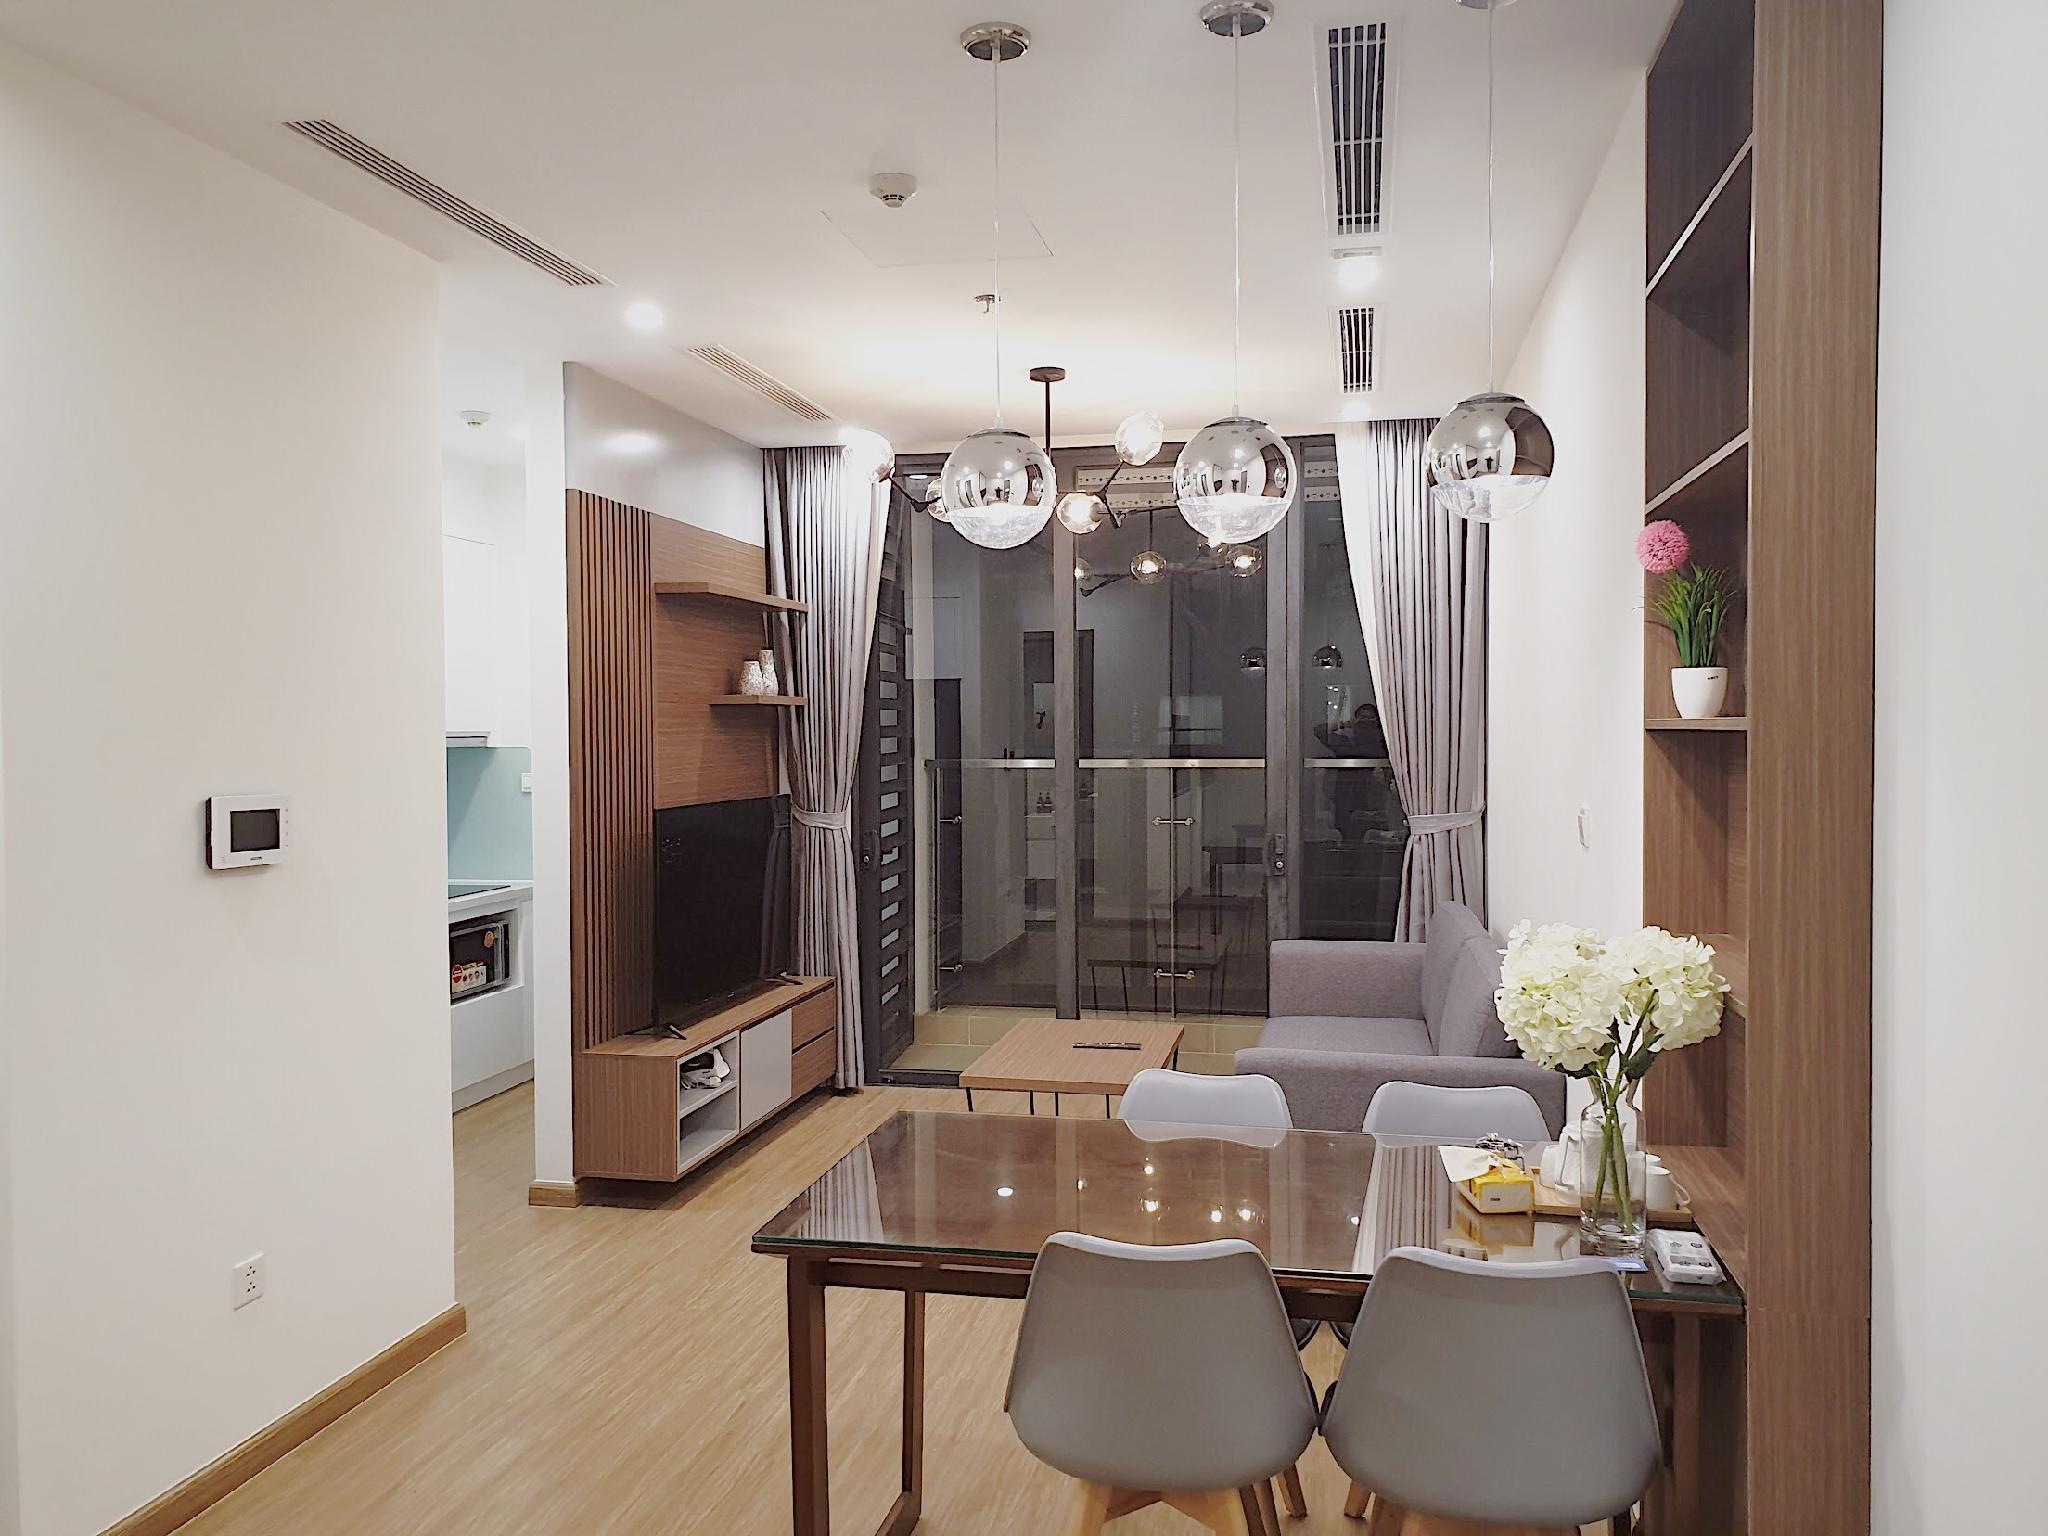 CleanandCozy 2BR Apartment Vinhomes Skylake